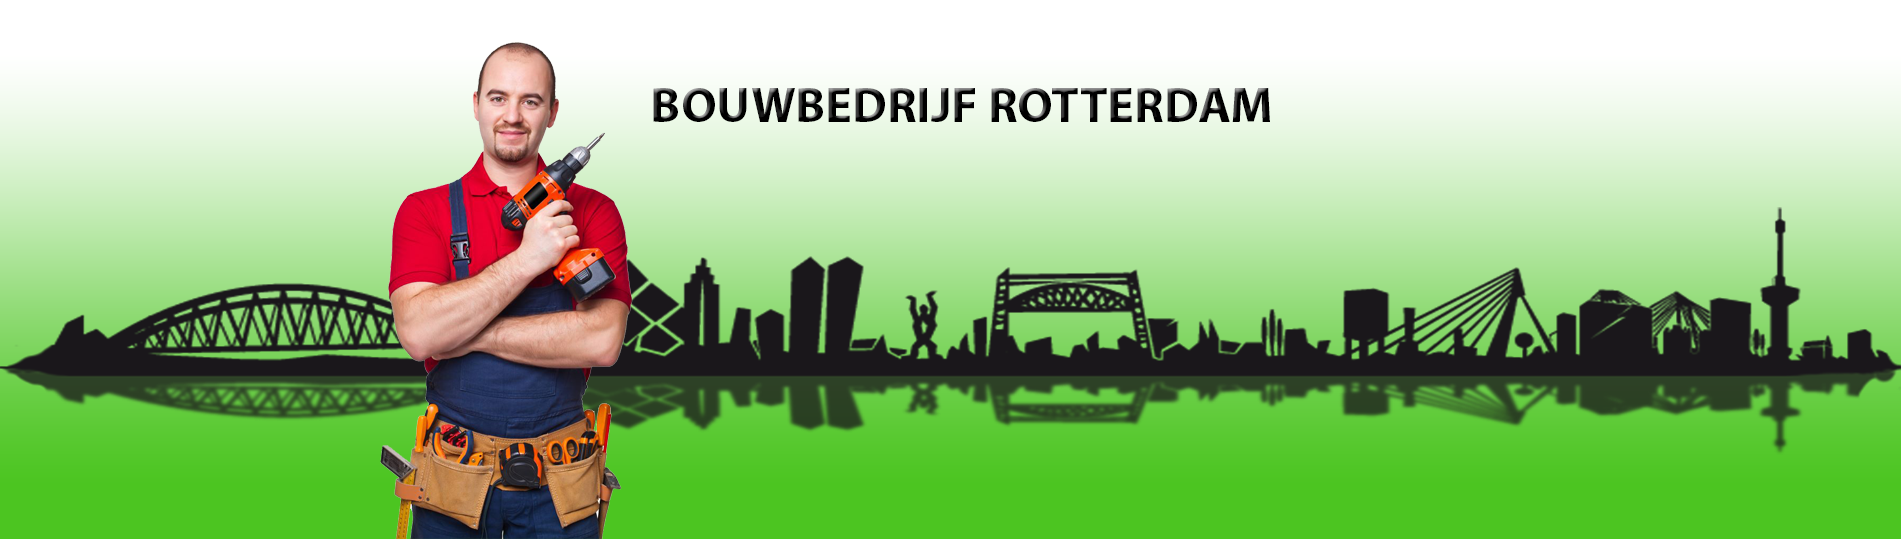 BOUWBEDRIJF-ROTTERDAM-SLIDER